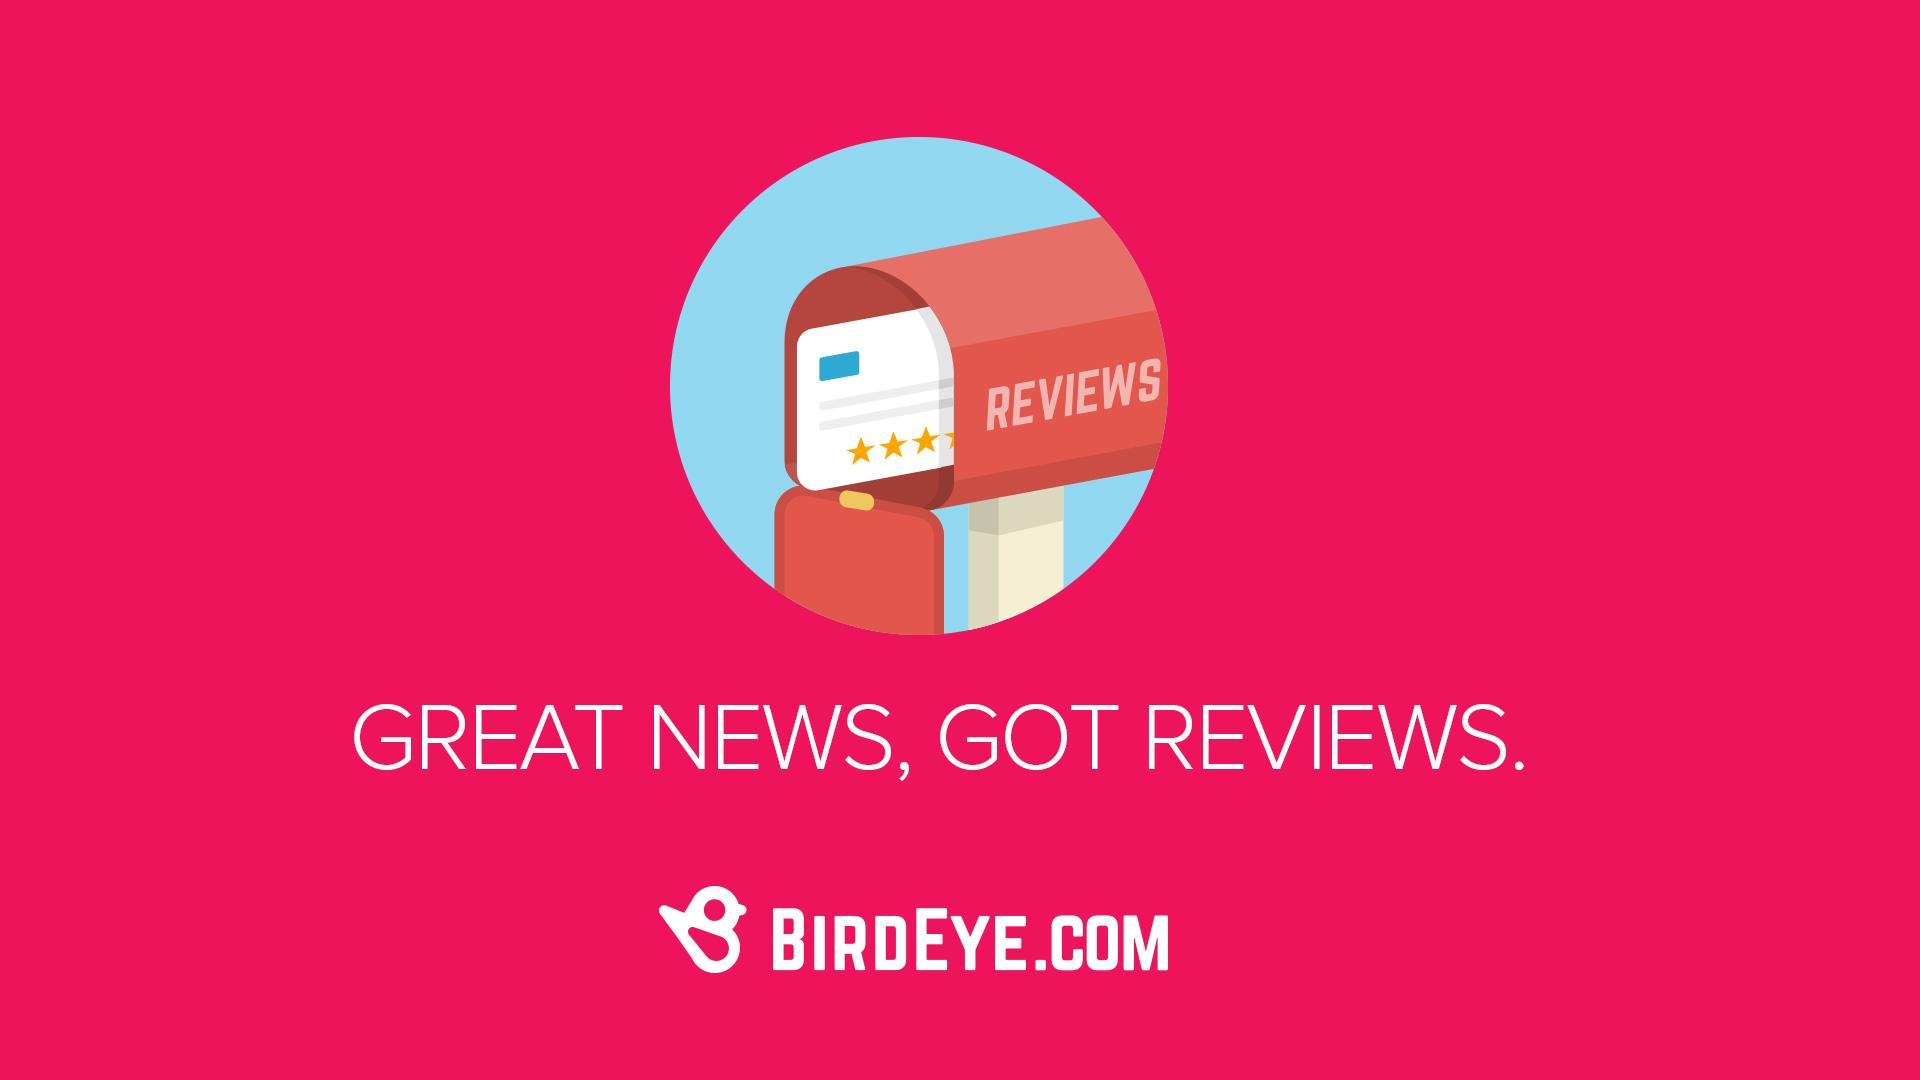 Birdeye_GreatNews